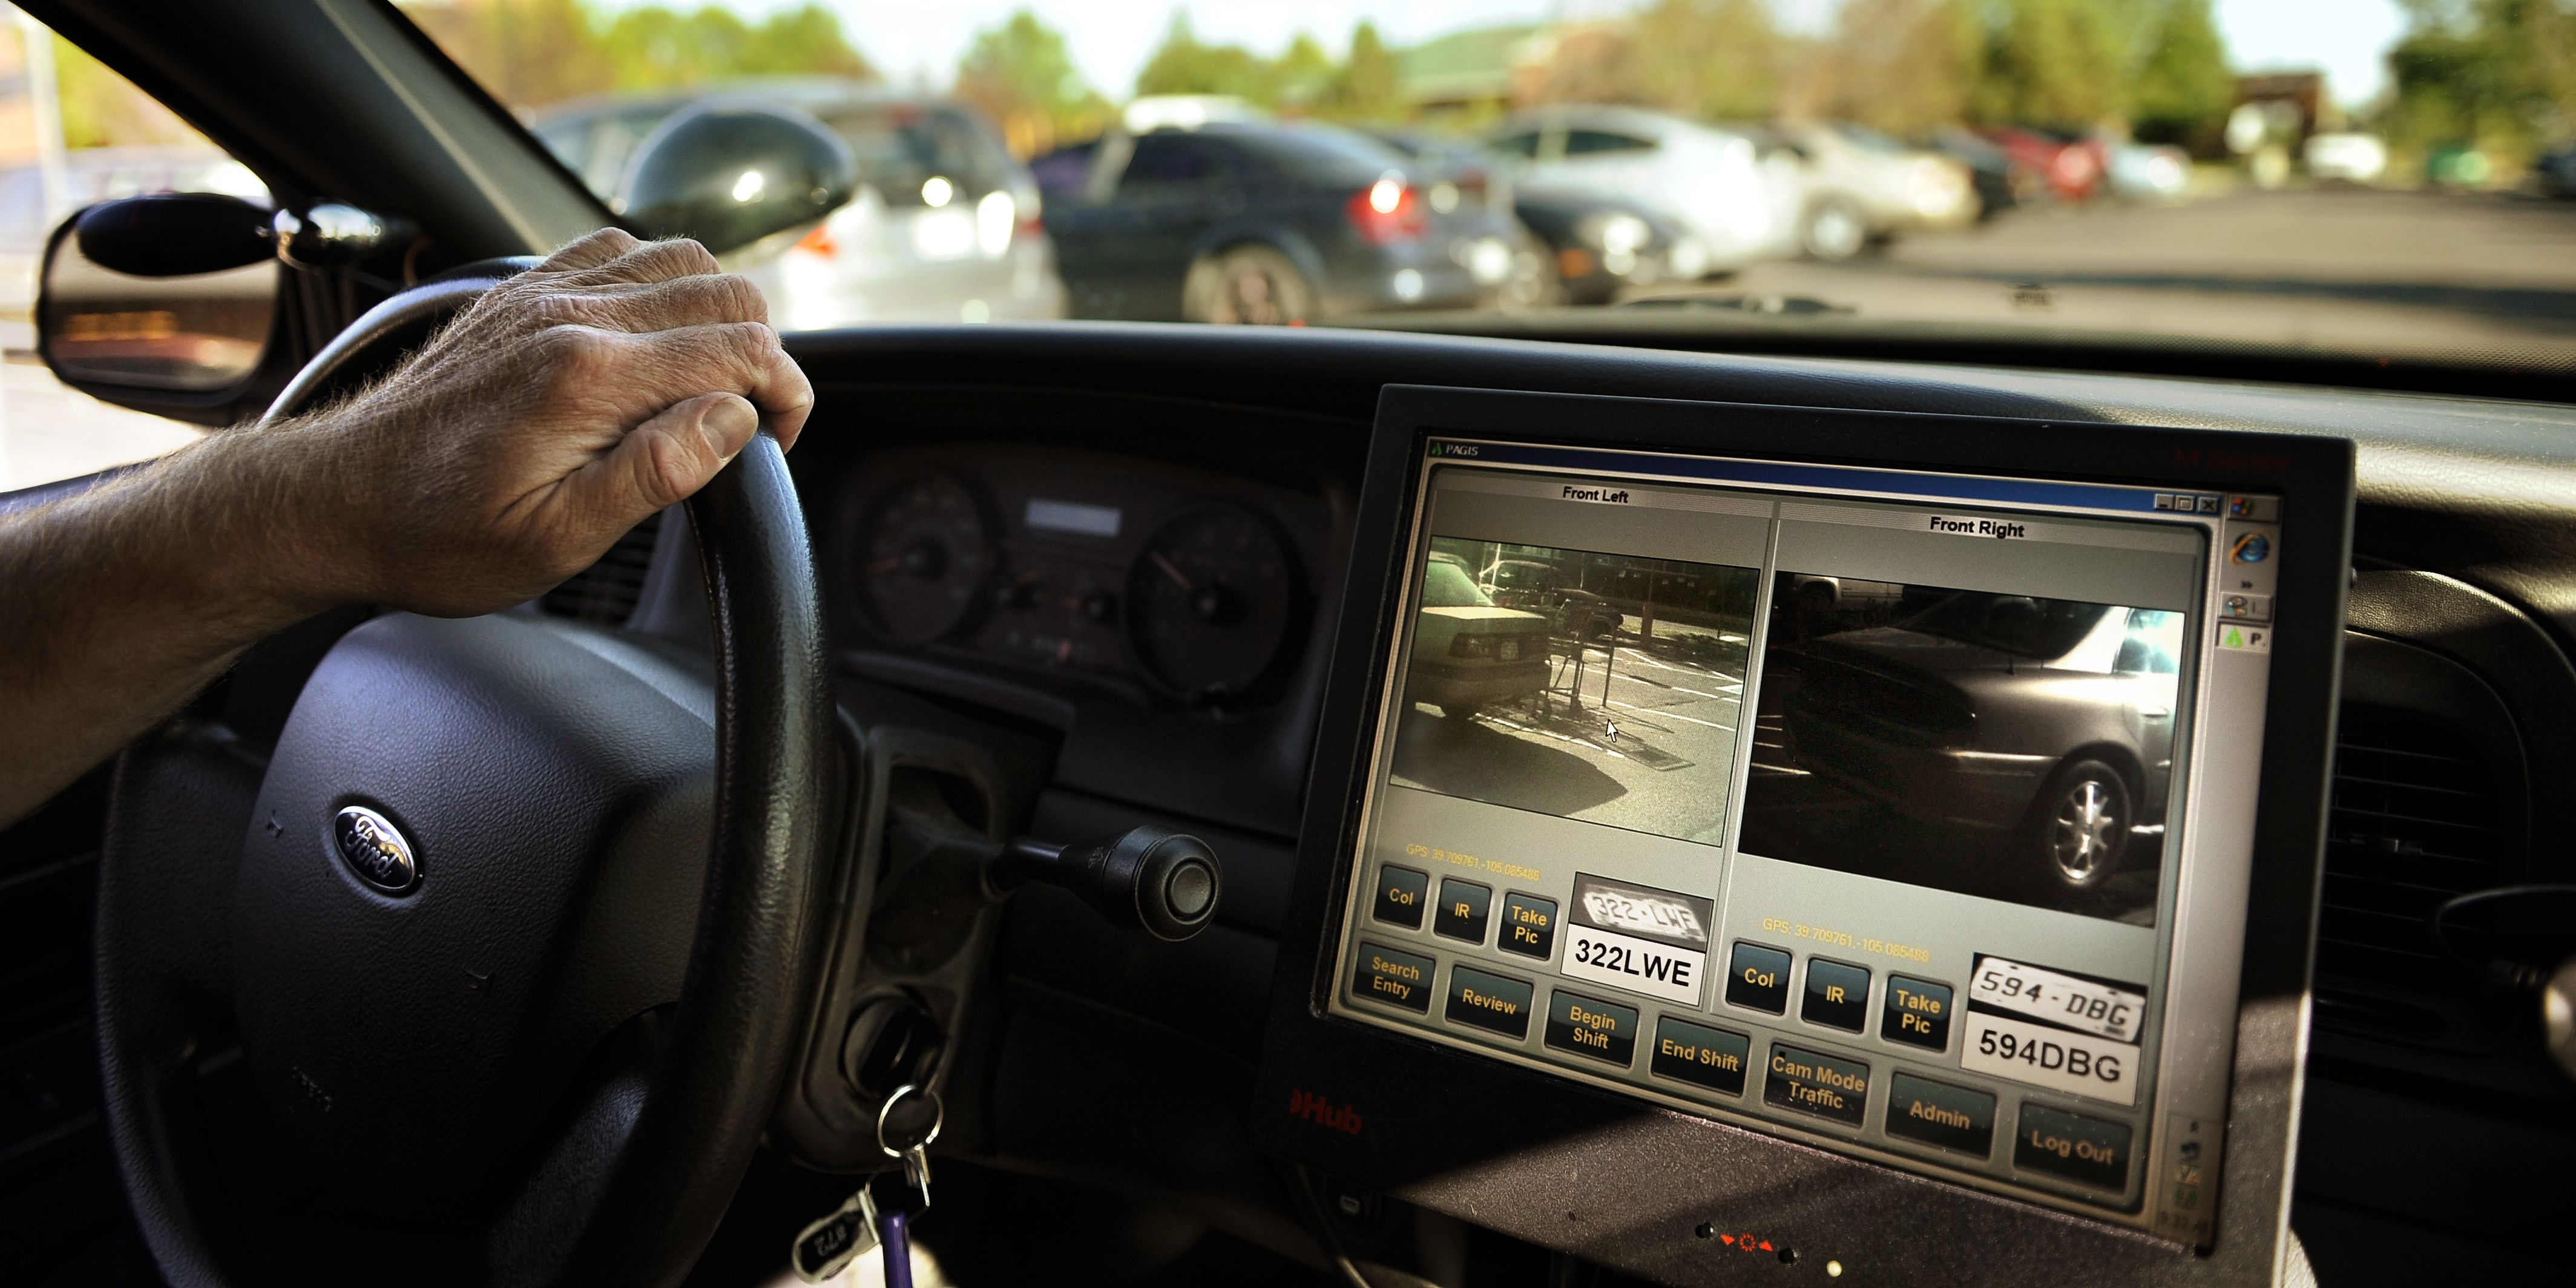 Rose Glen North Dakota ⁓ Try These Online Police Scanner